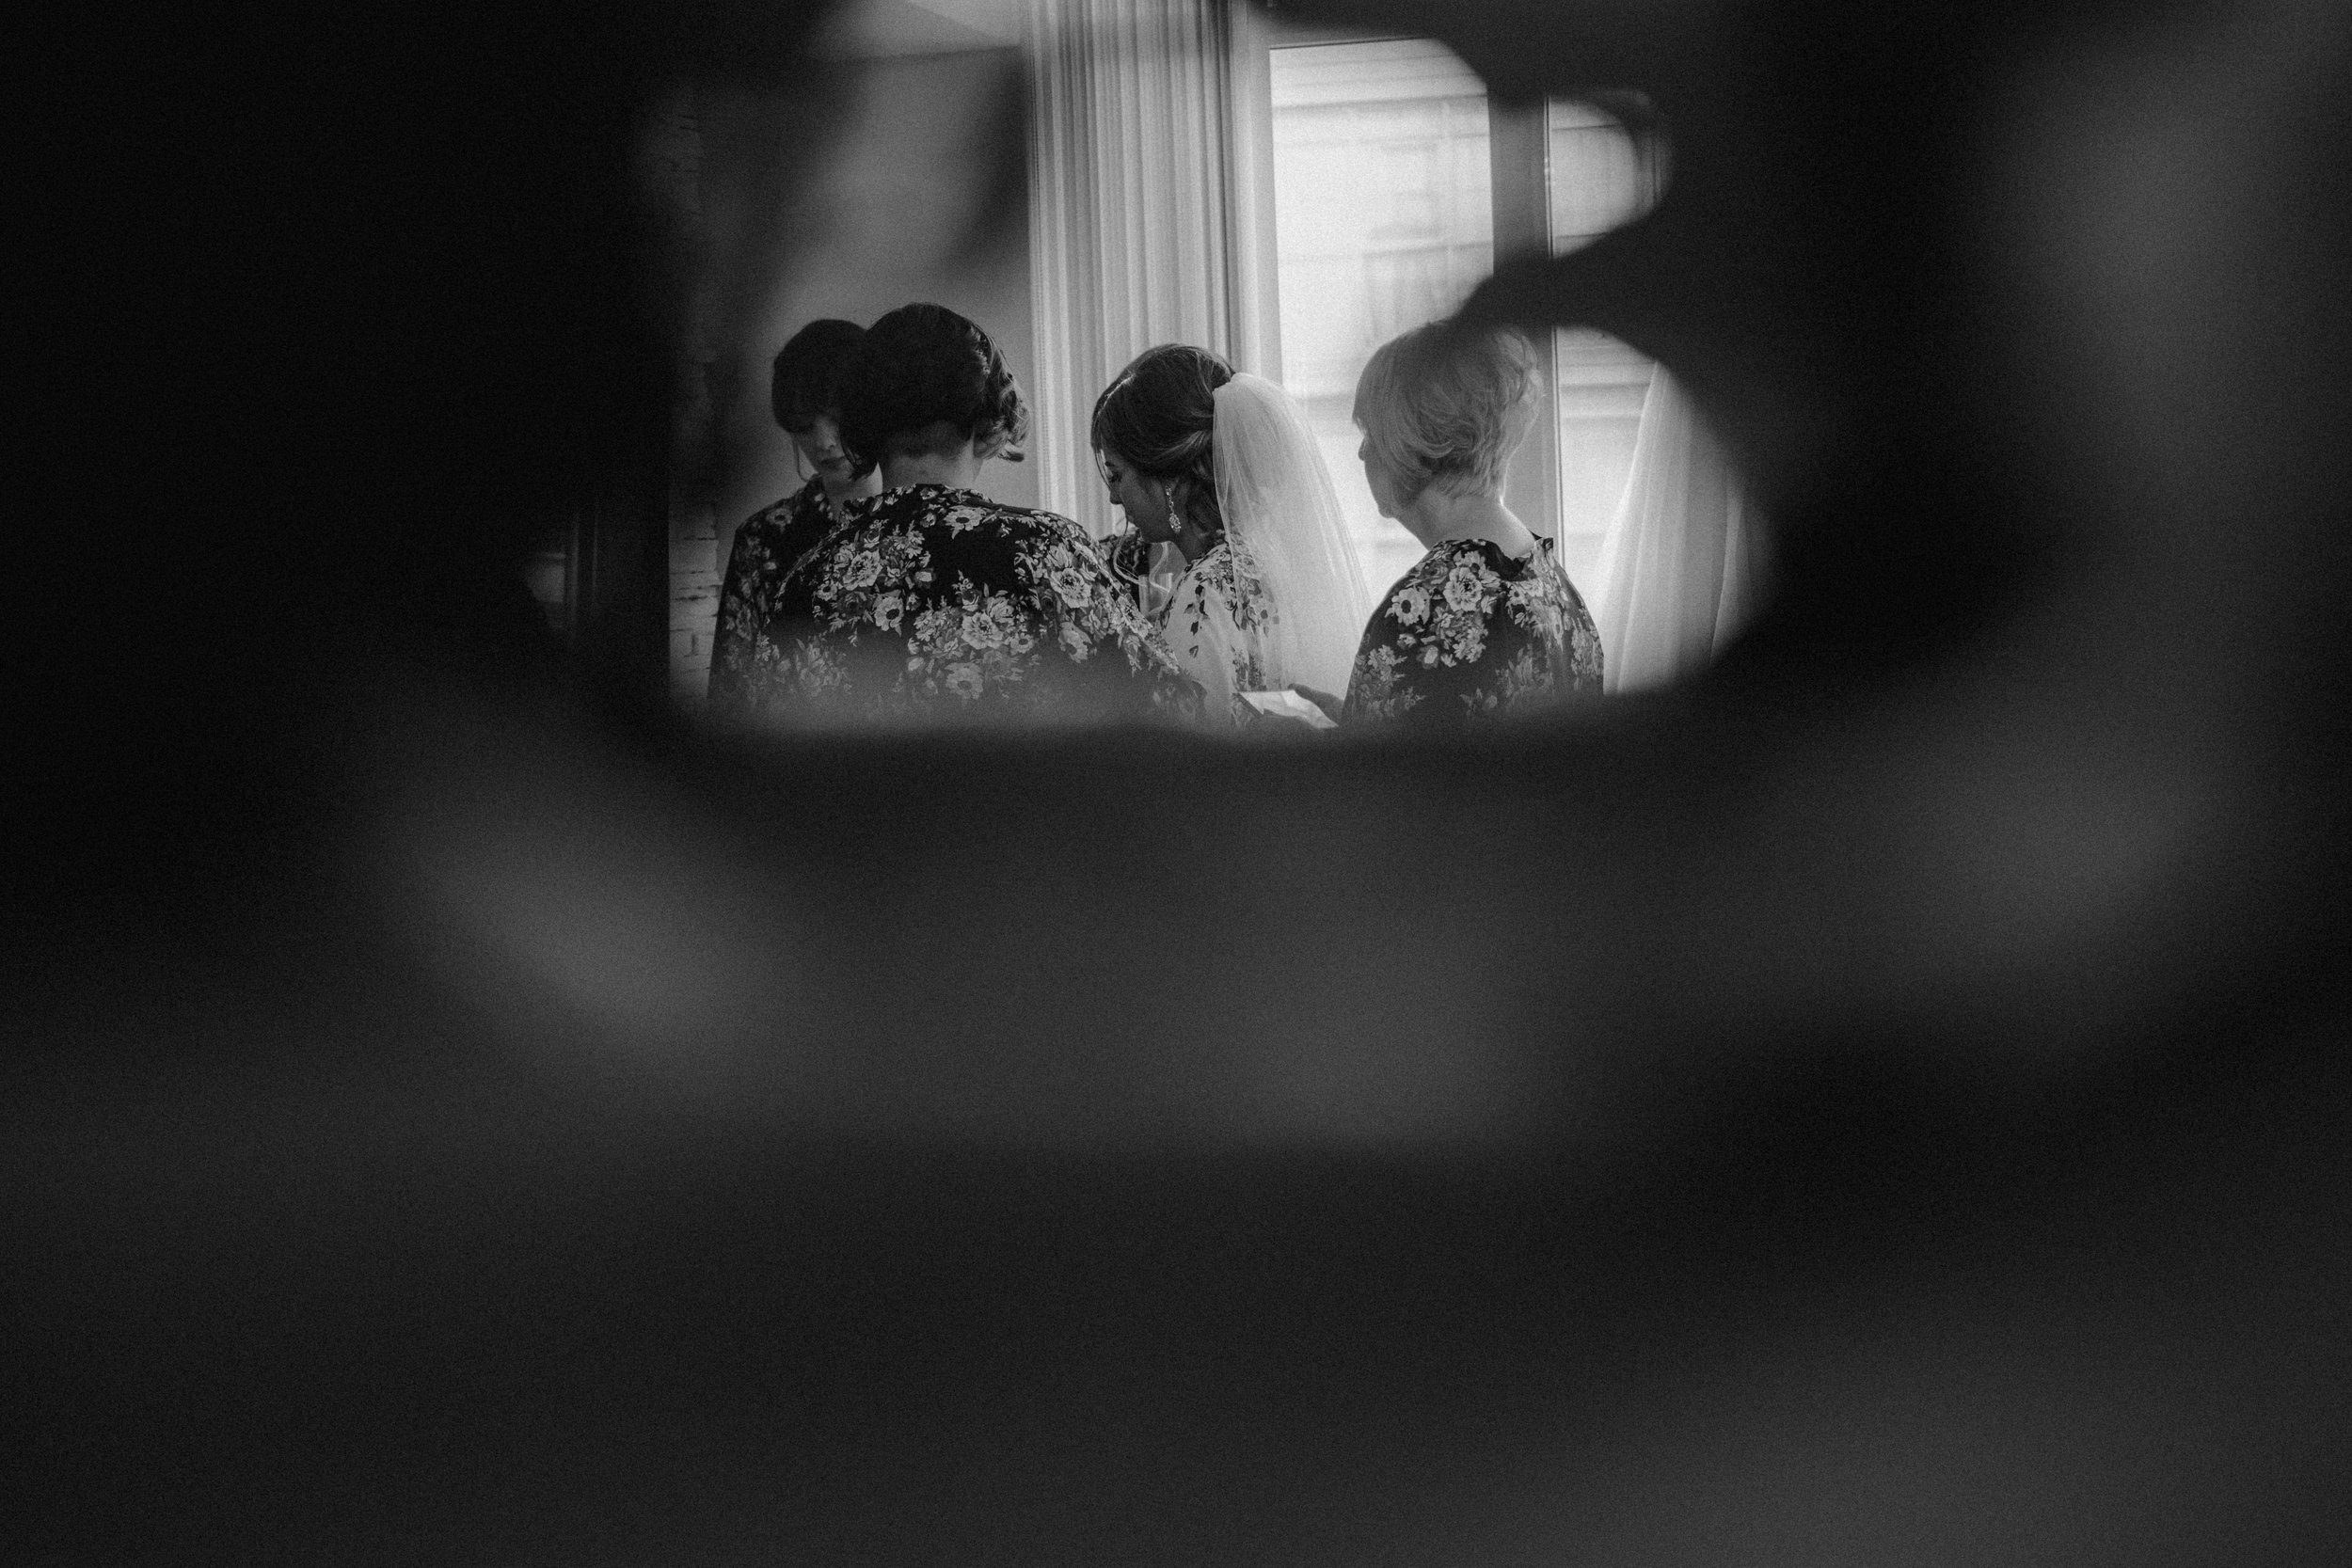 mariage_photographe_toronto_gatineau_ottawa_photographer_wedding-4.jpg